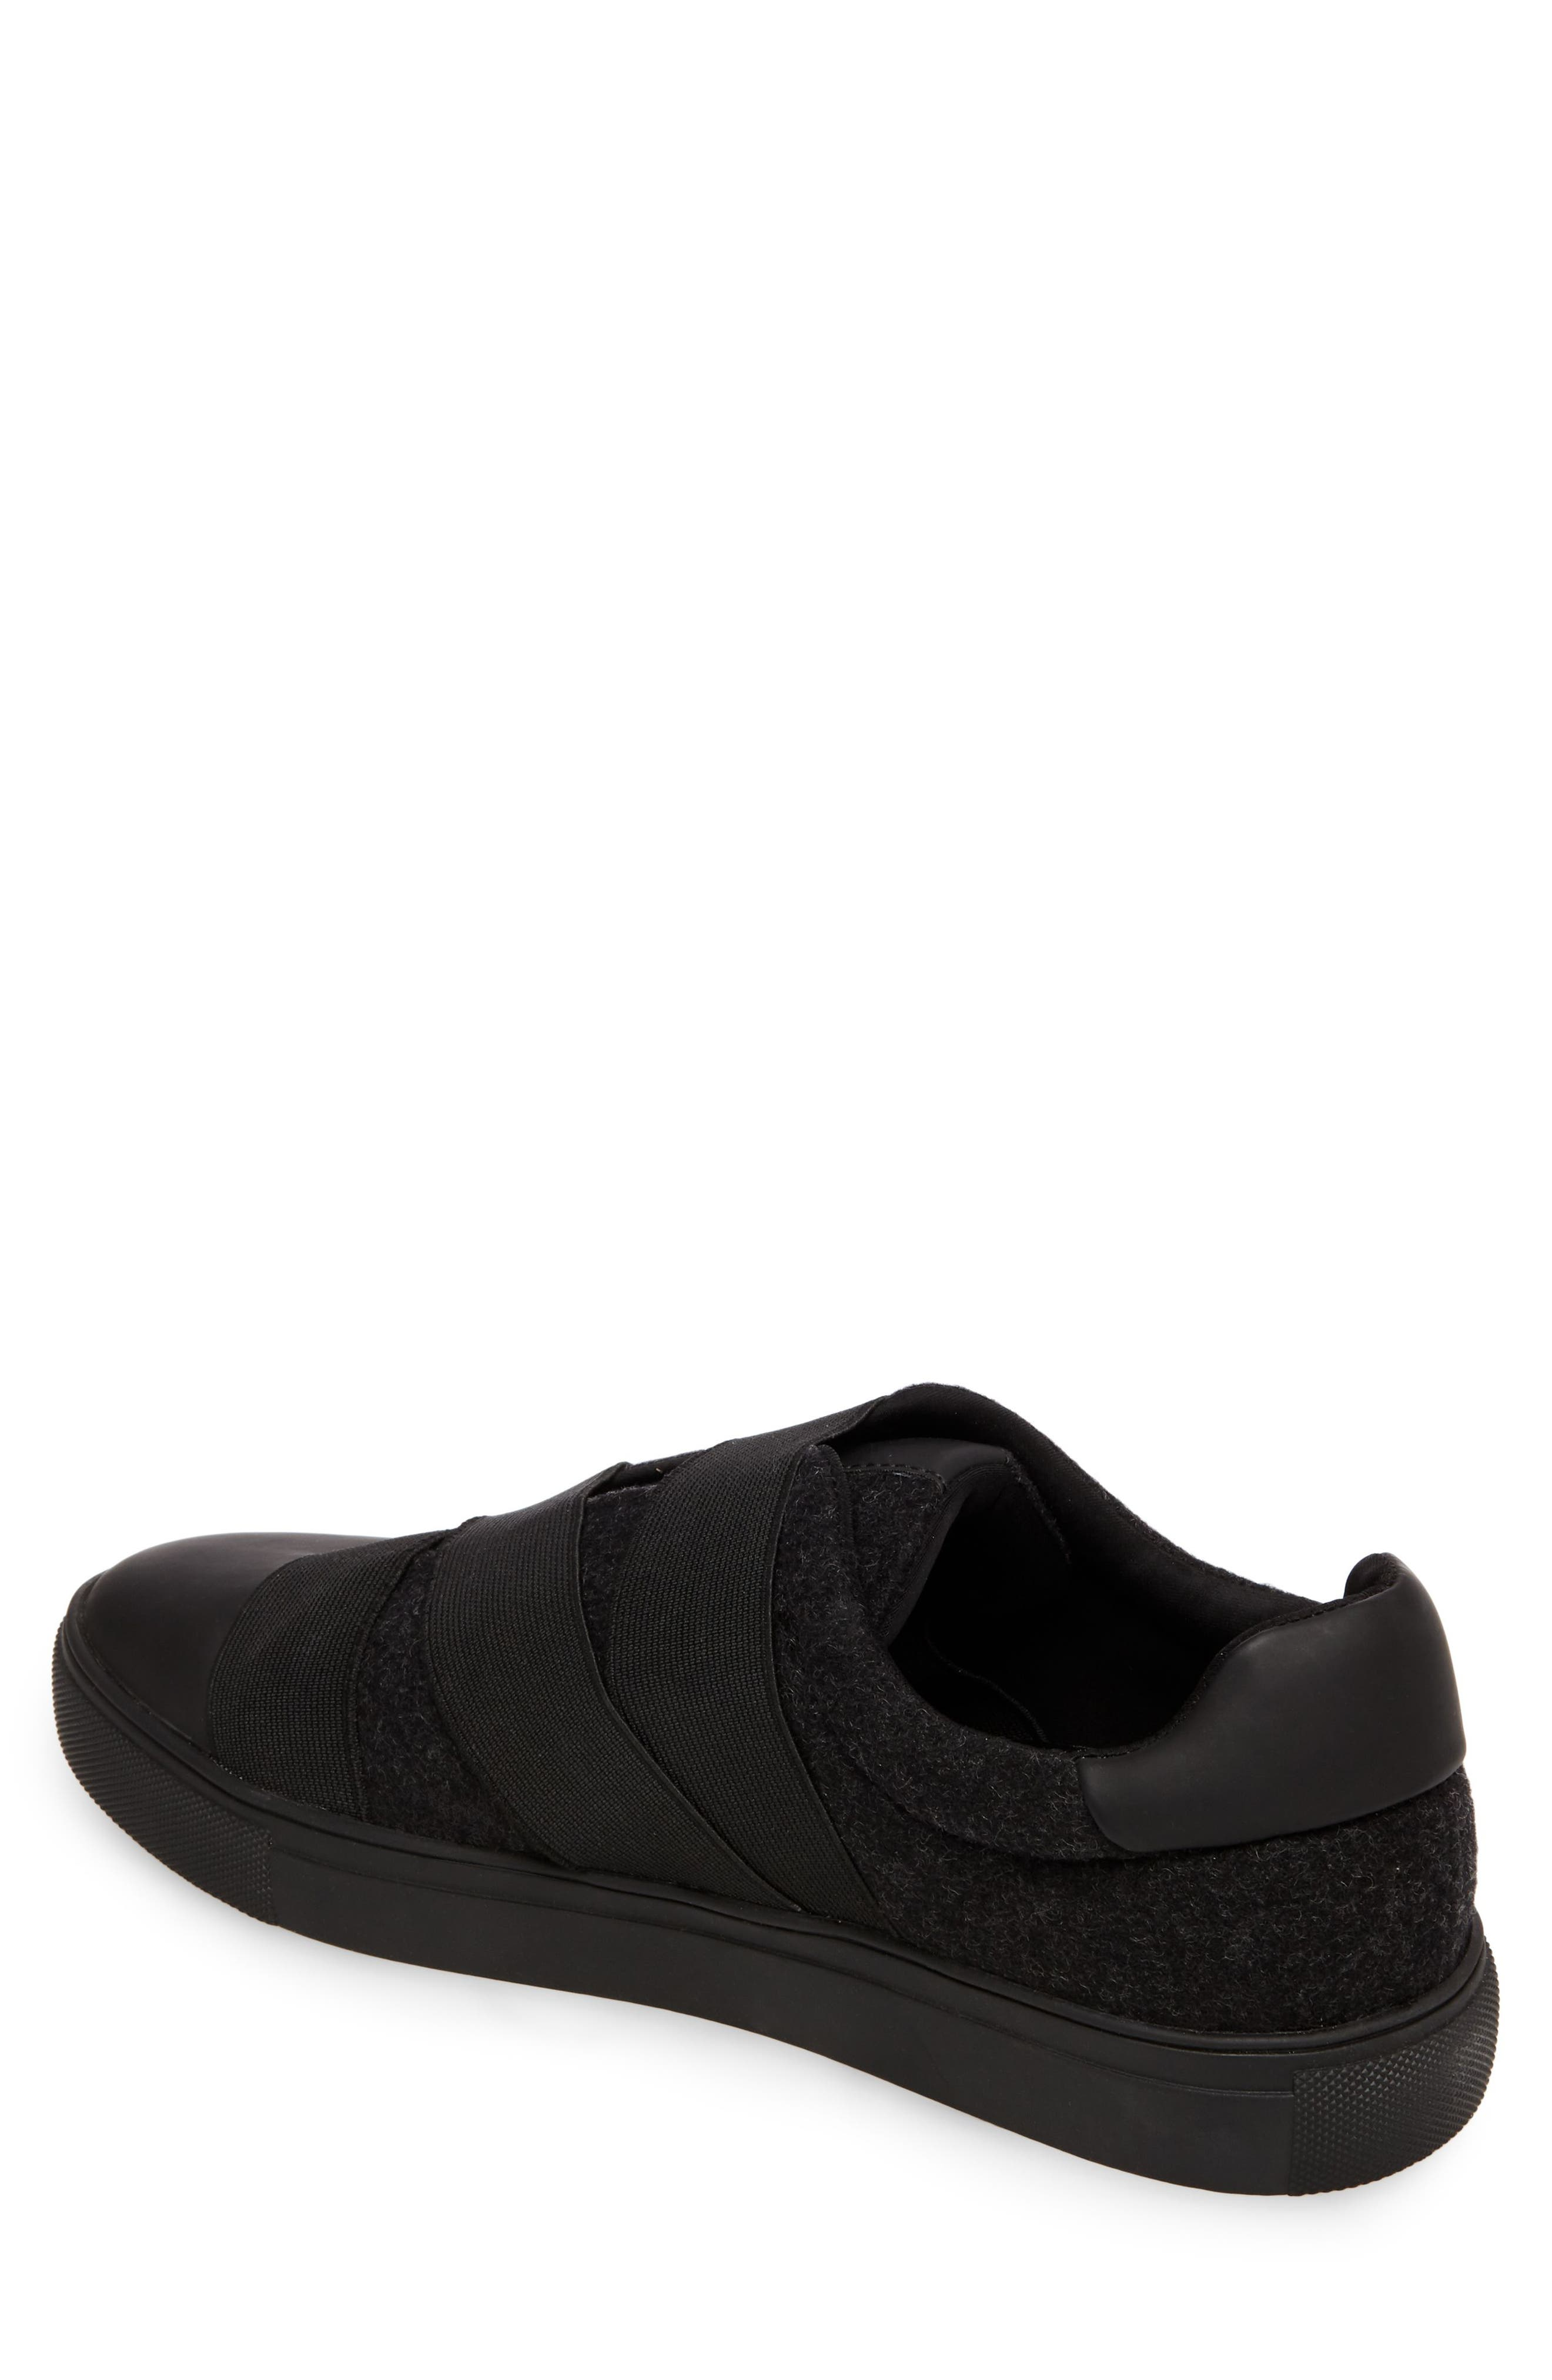 Westy Sneaker,                             Alternate thumbnail 2, color,                             Black